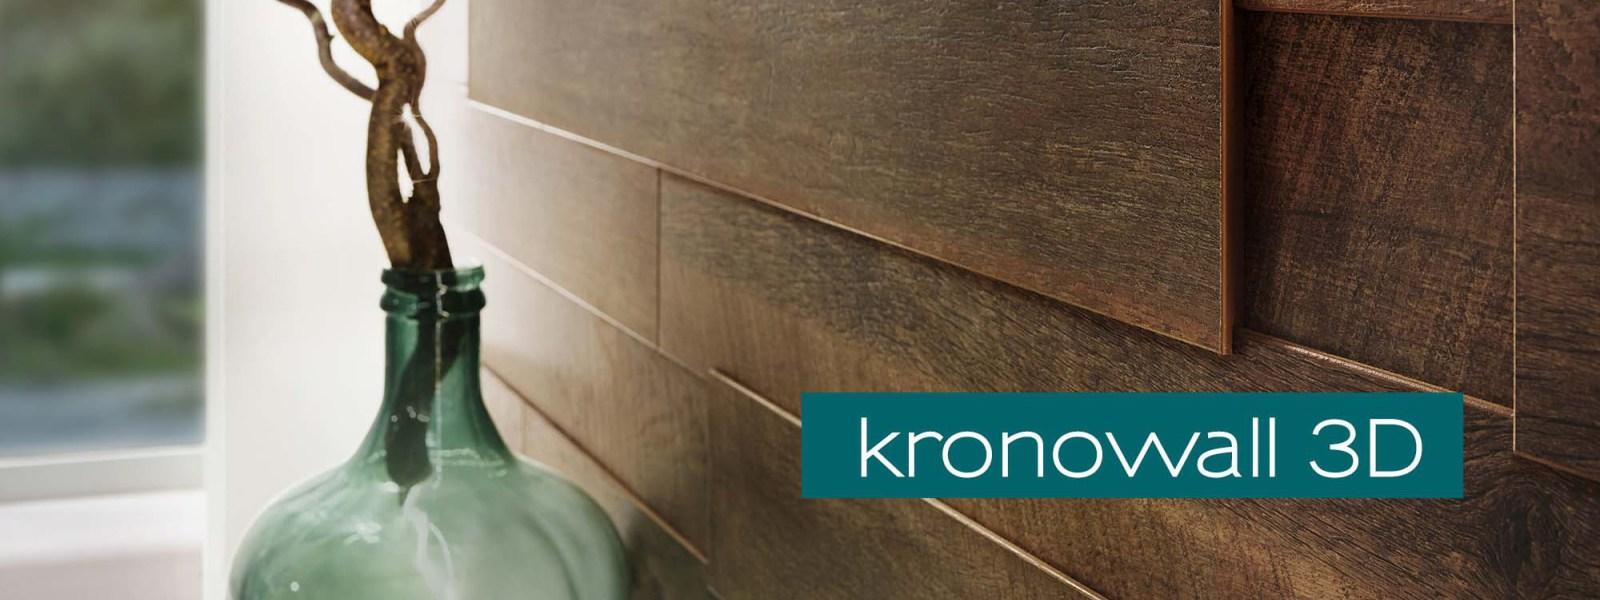 3d wandpaneele laminat mit 3d effekt kronowall 3d. Black Bedroom Furniture Sets. Home Design Ideas